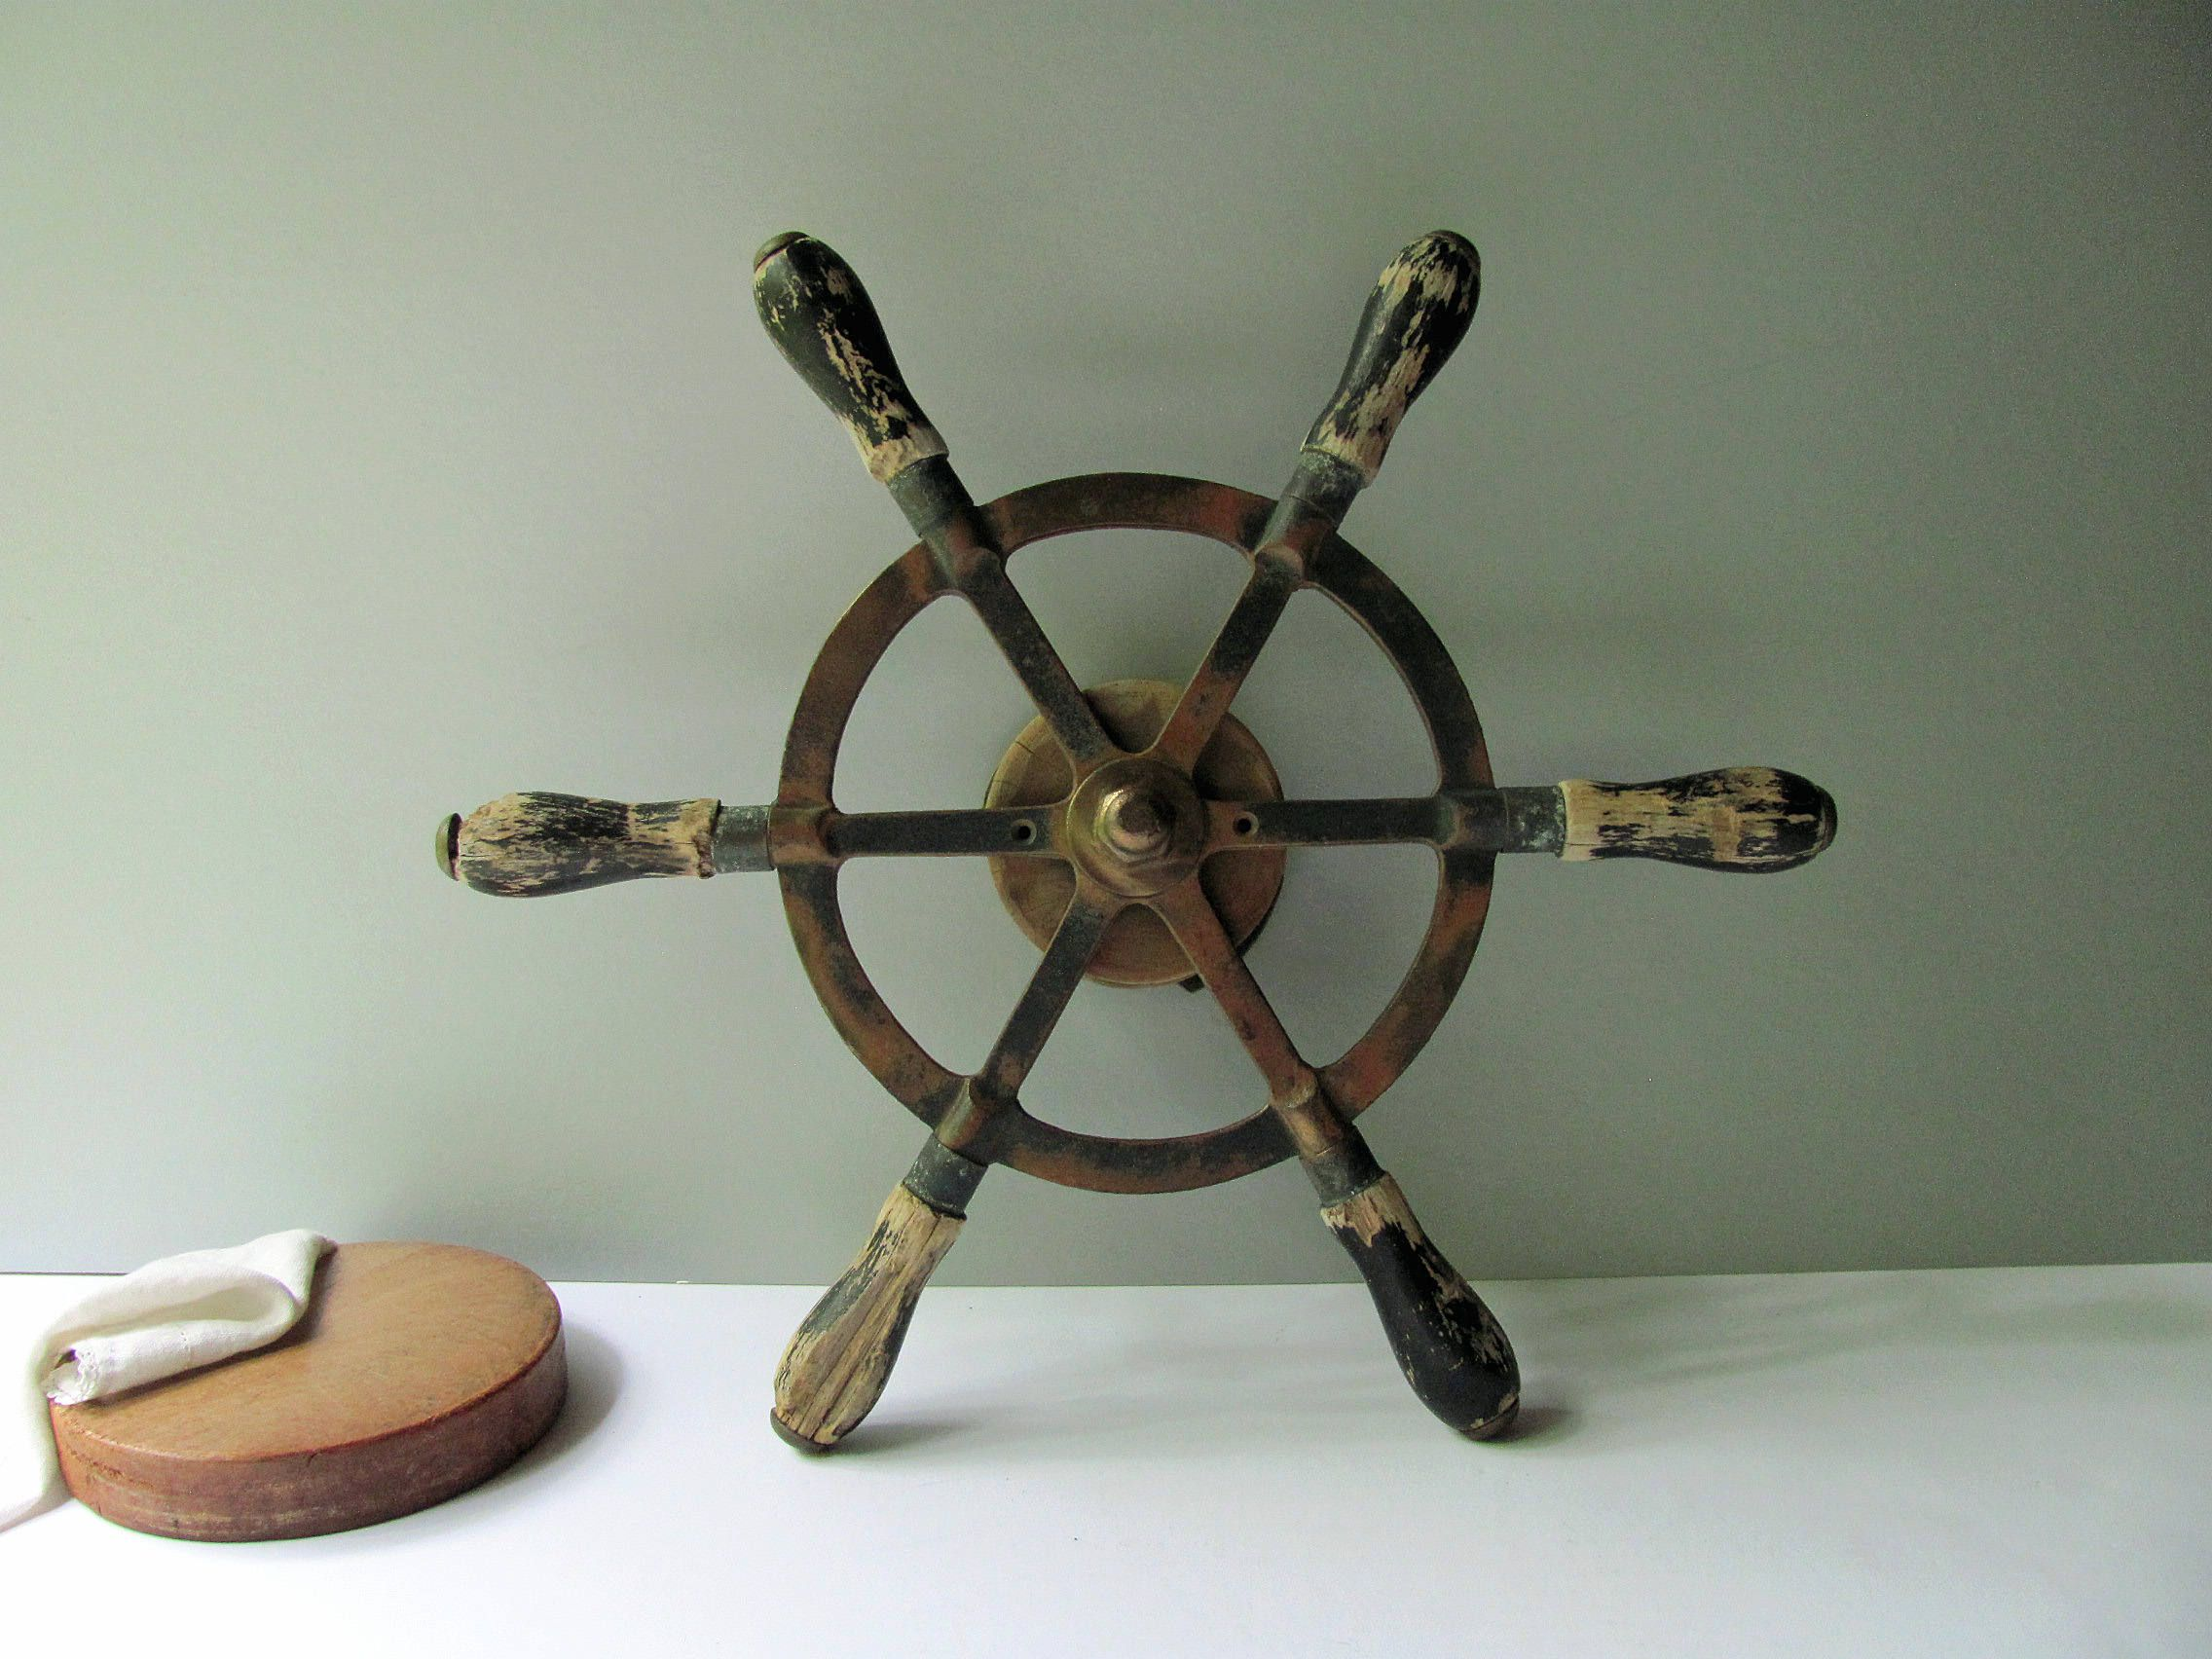 Vintage Boat Wheel Ship Yacht Steering Wheel Helm Bronze Spokes Wood Handles Drum Nautical Decor Rustic Wed Vintage Boats Lake Cottage Decor Vintage Nautical